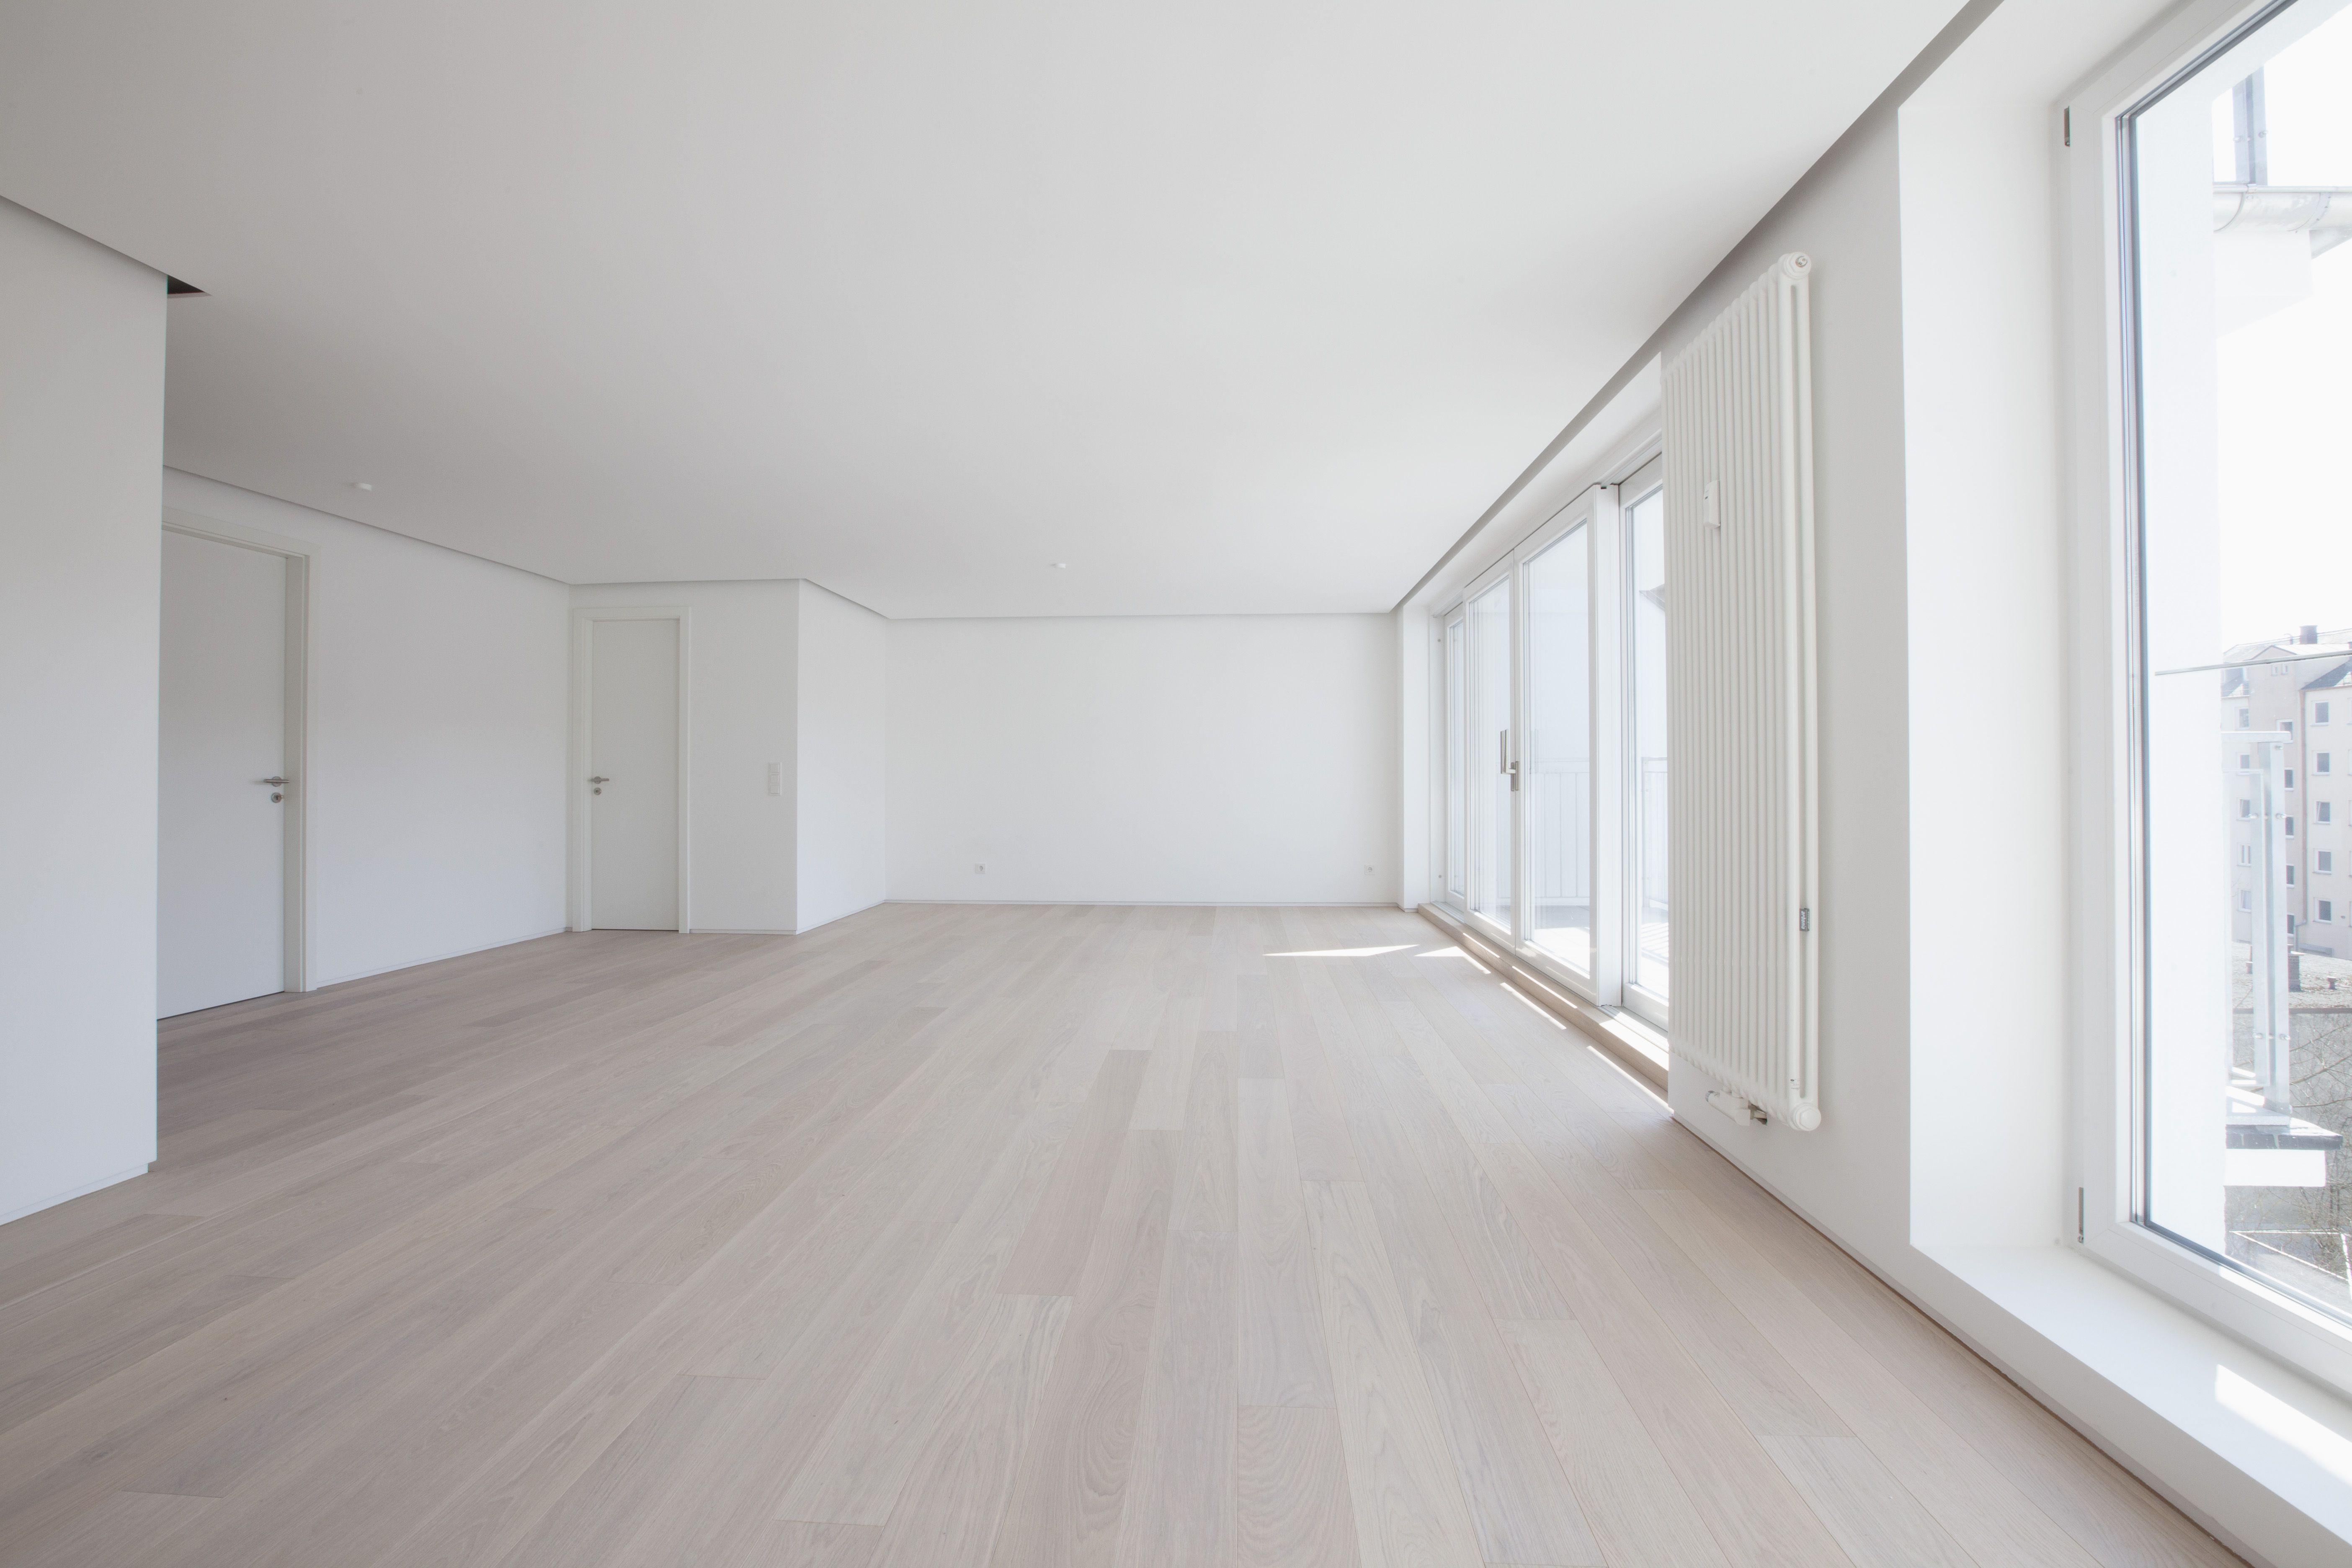 bamboo flooring vs engineered hardwood flooring of basics of favorite hybrid engineered wood floors within empty living room in modern apartment 578189139 58866f903df78c2ccdecab05